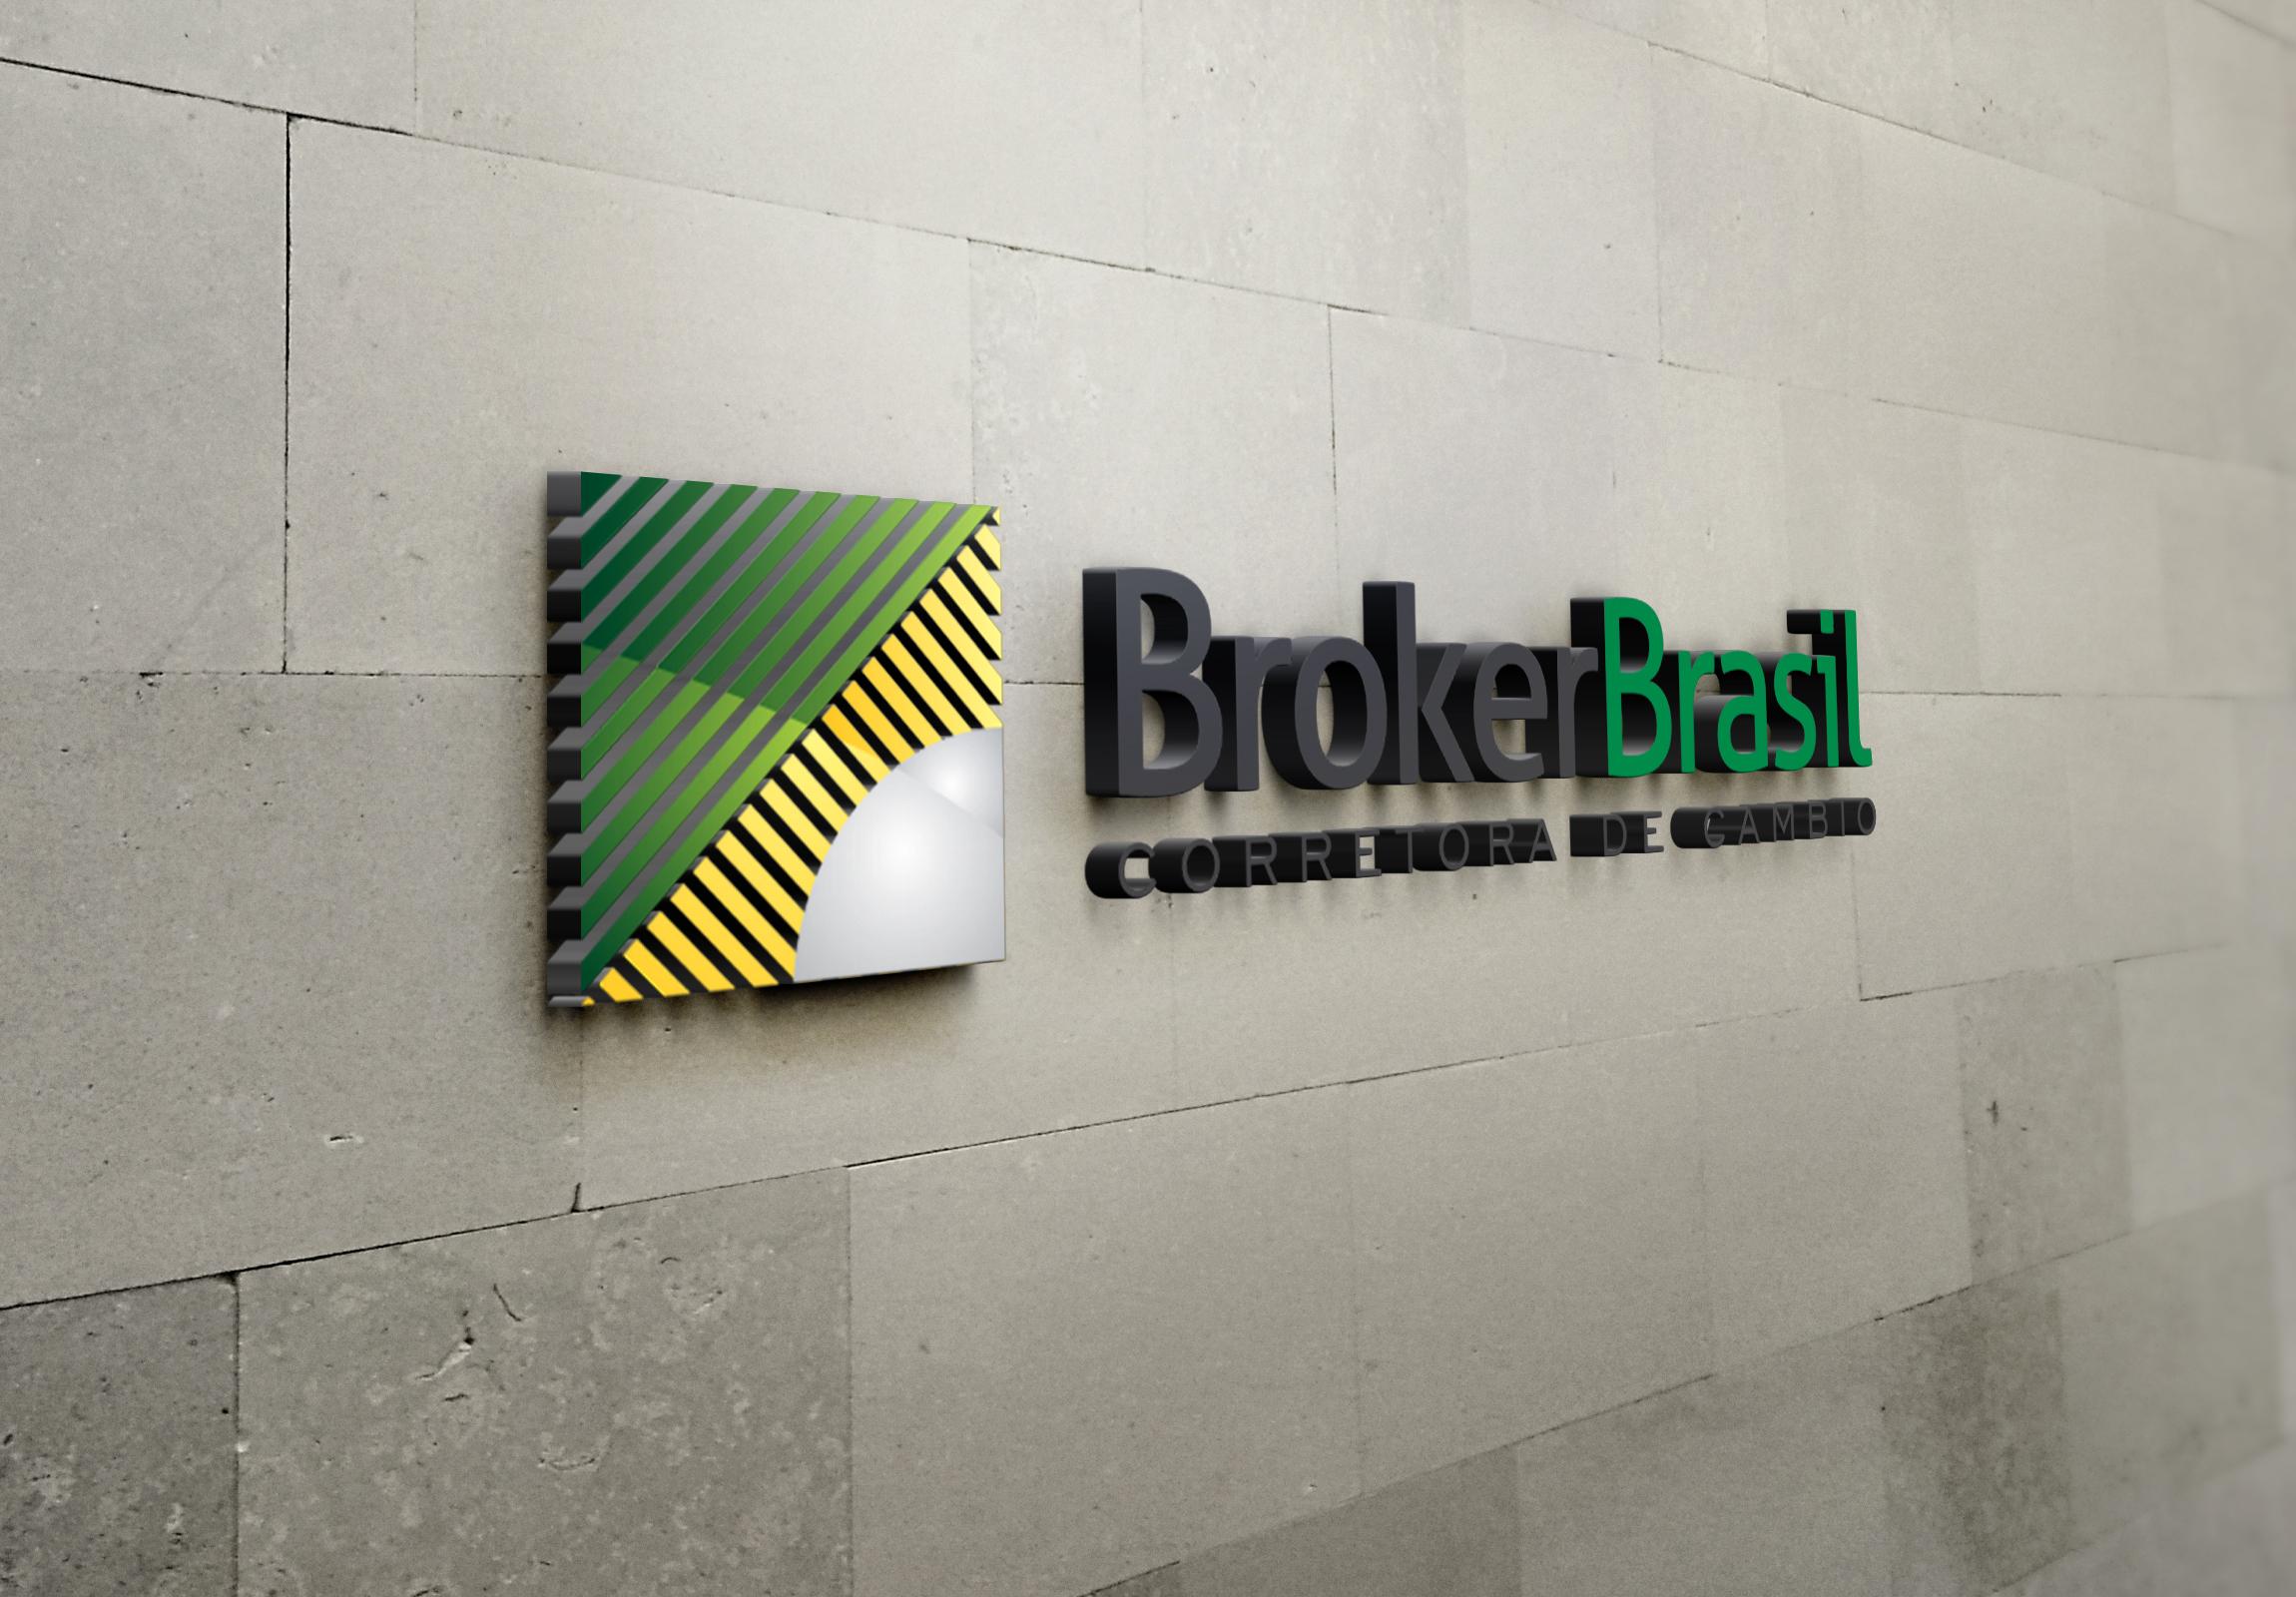 moo_design_broker_brasil_2